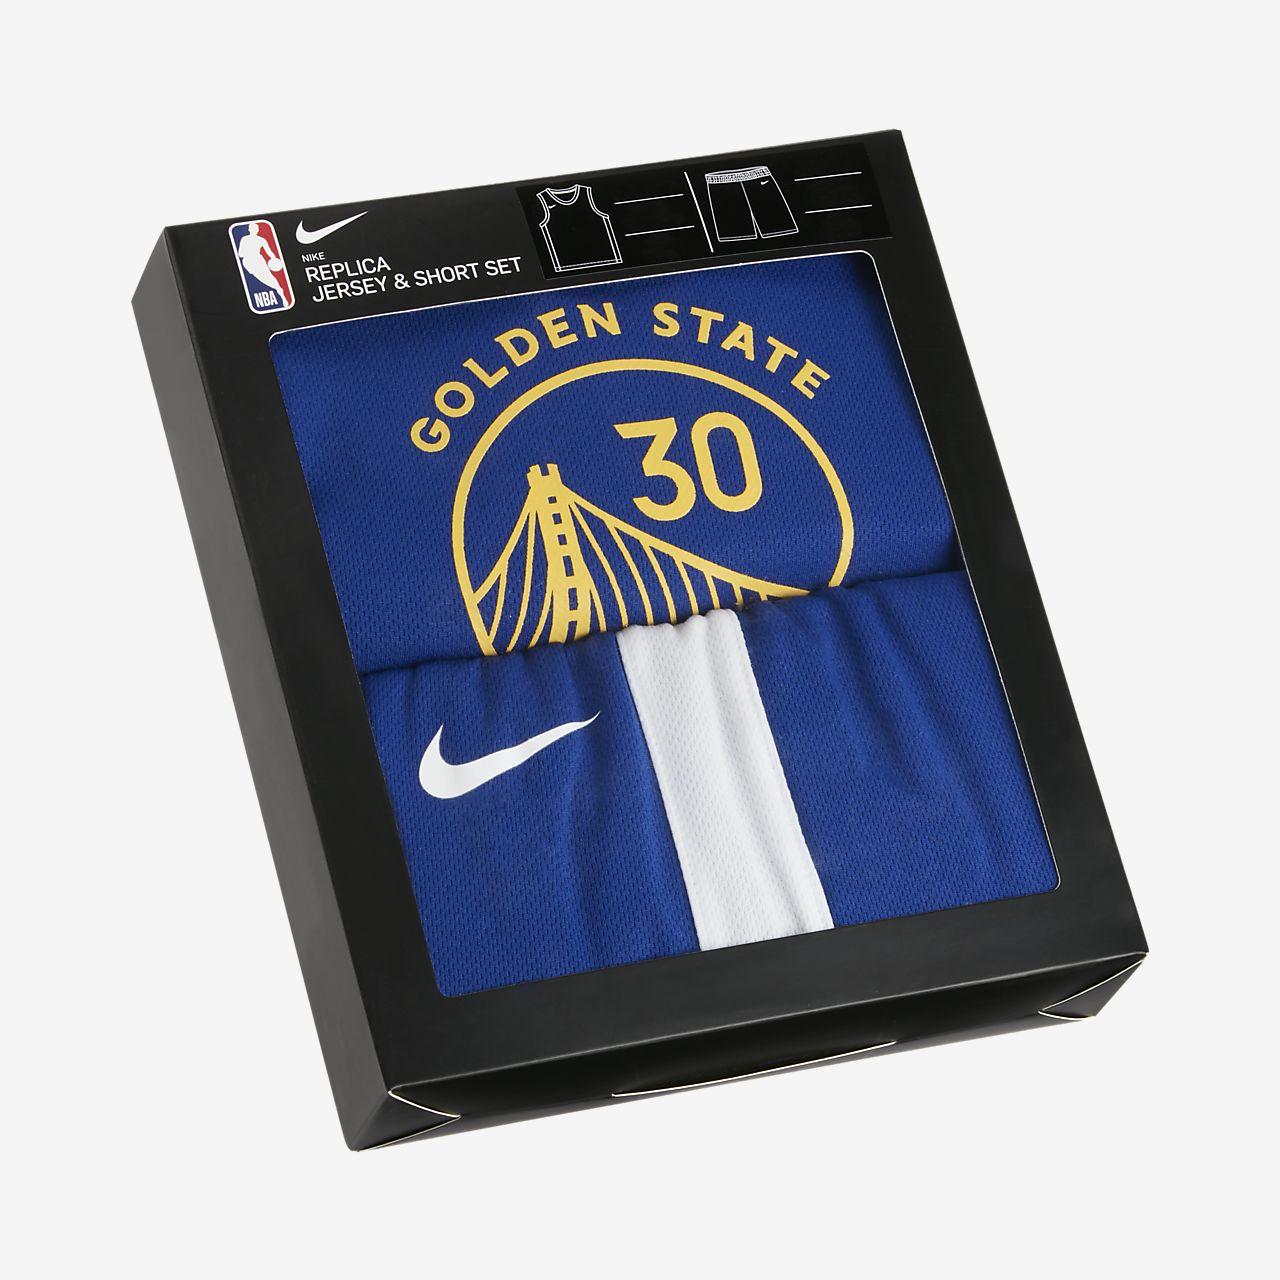 Warriors Replica Conjunto de camiseta y pantalón corto Nike NBA Infantil